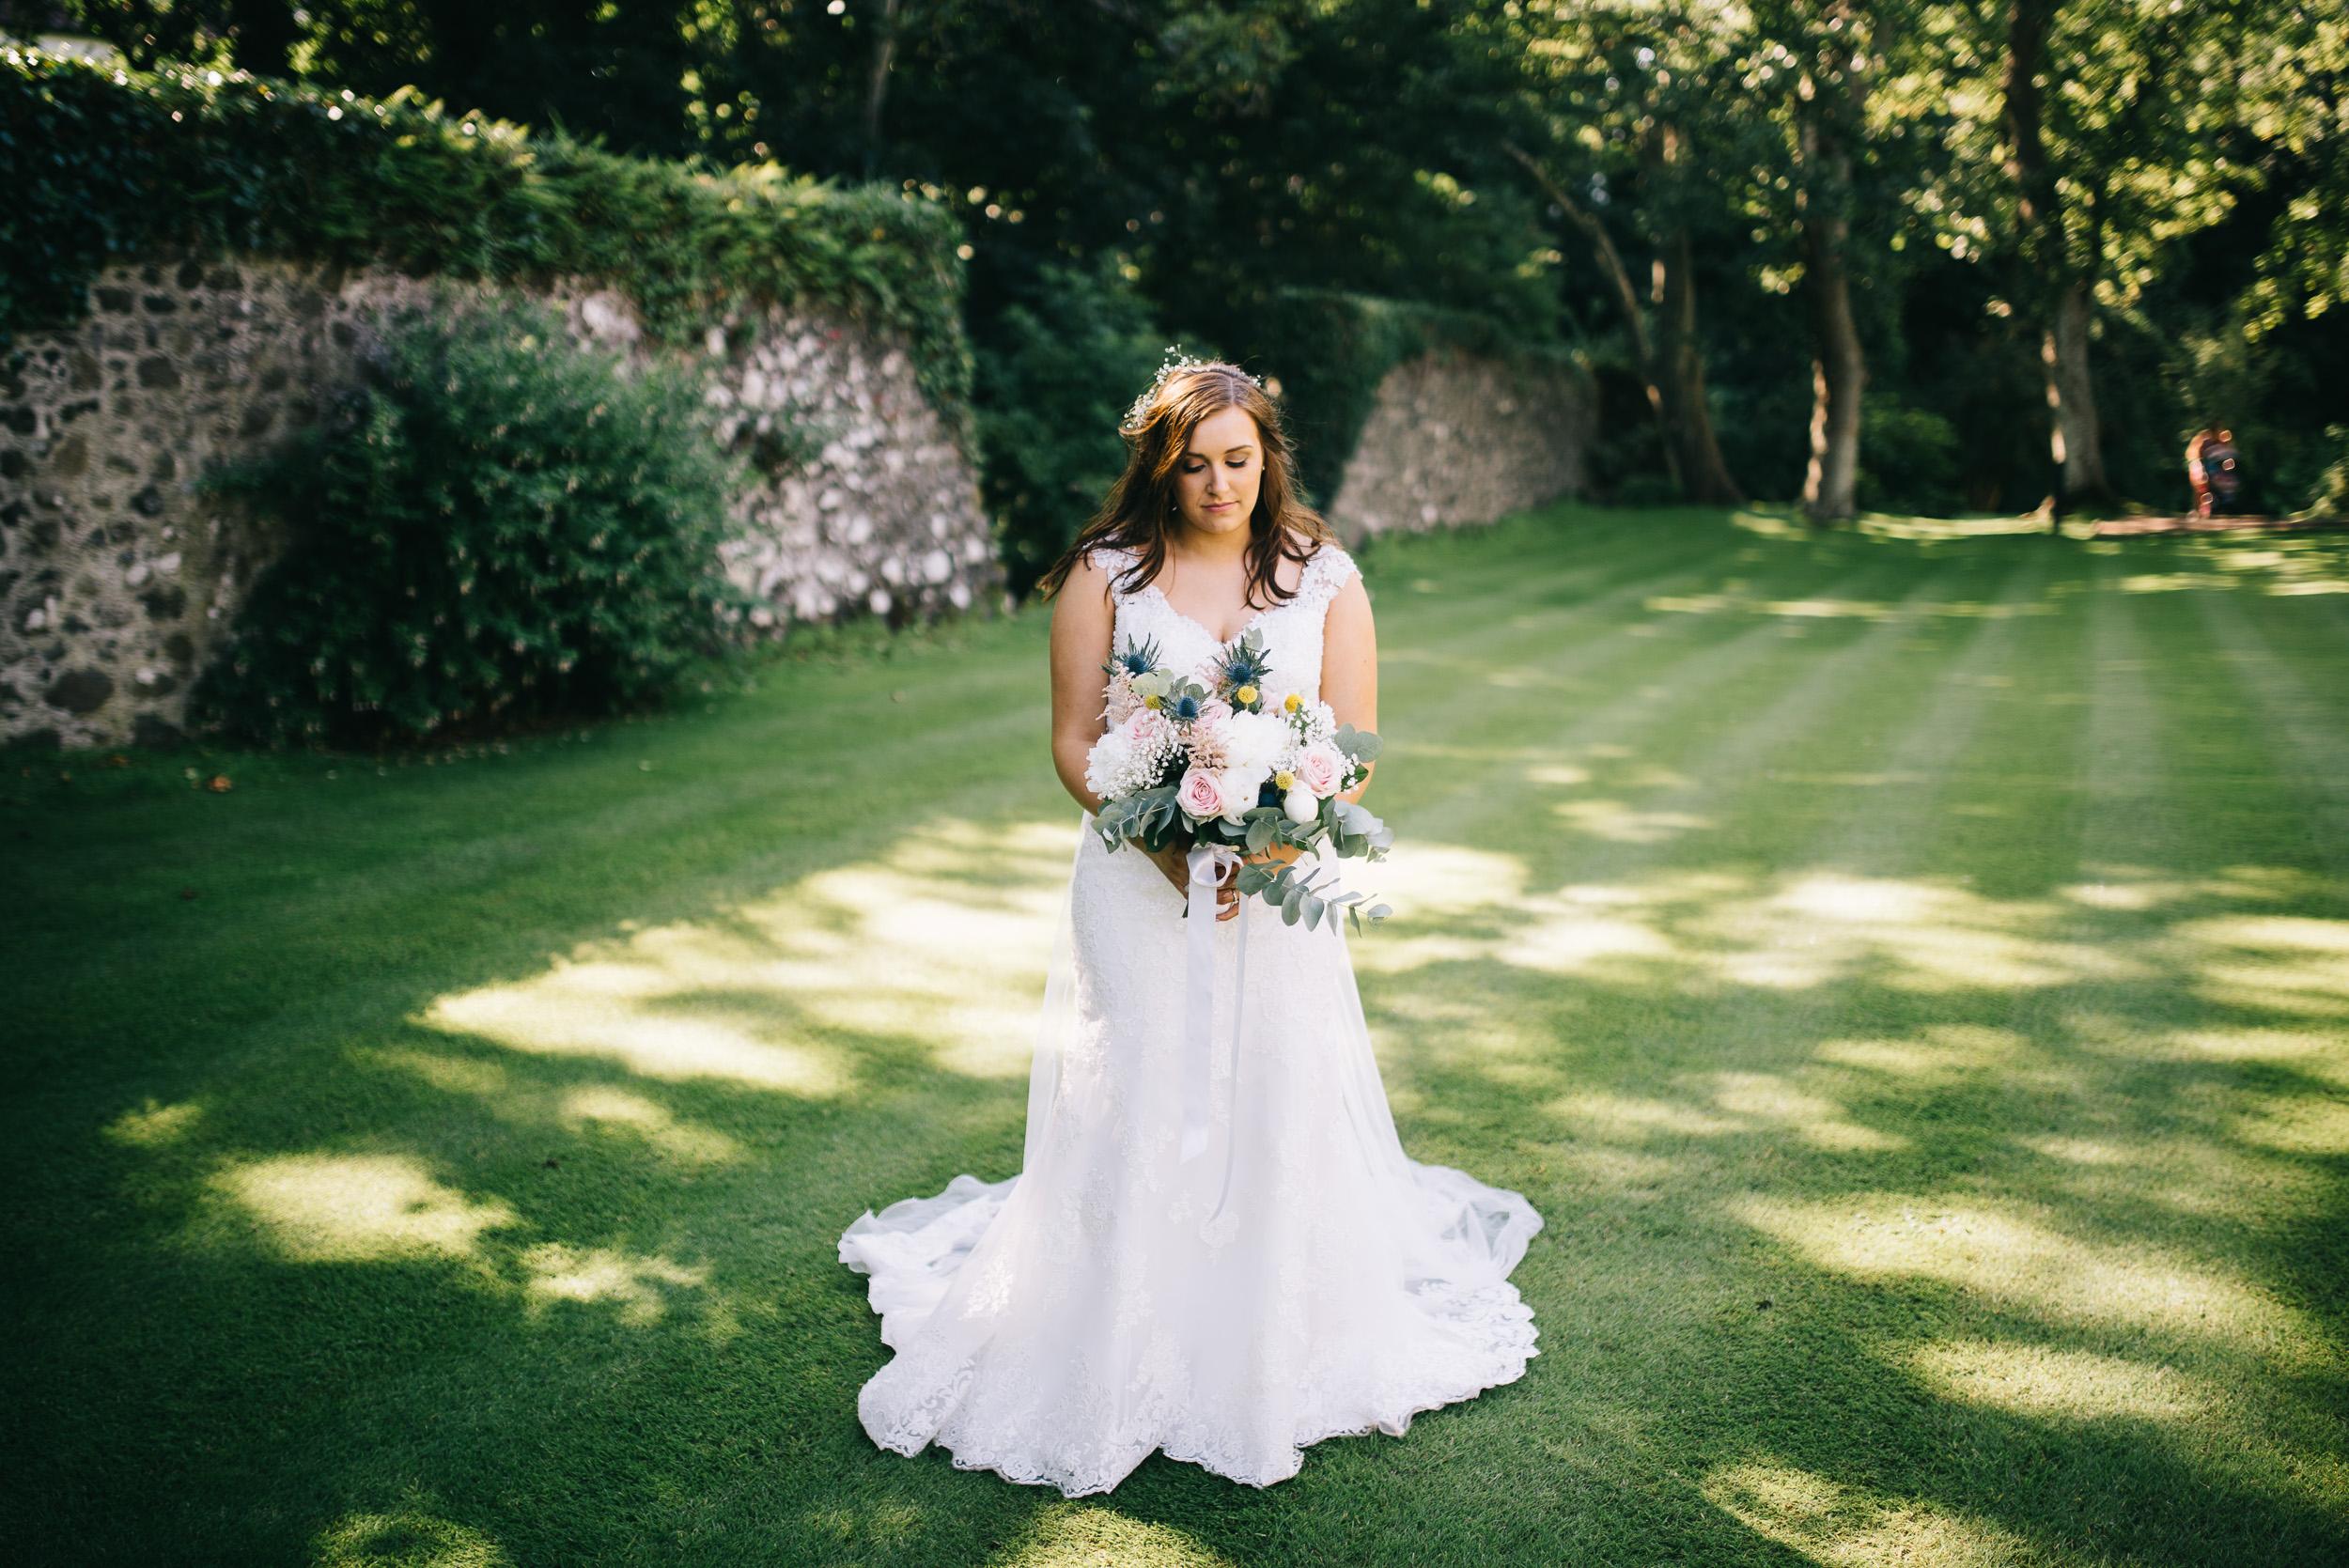 wedding photogaphy peter mackey 2018 beth-10.jpg